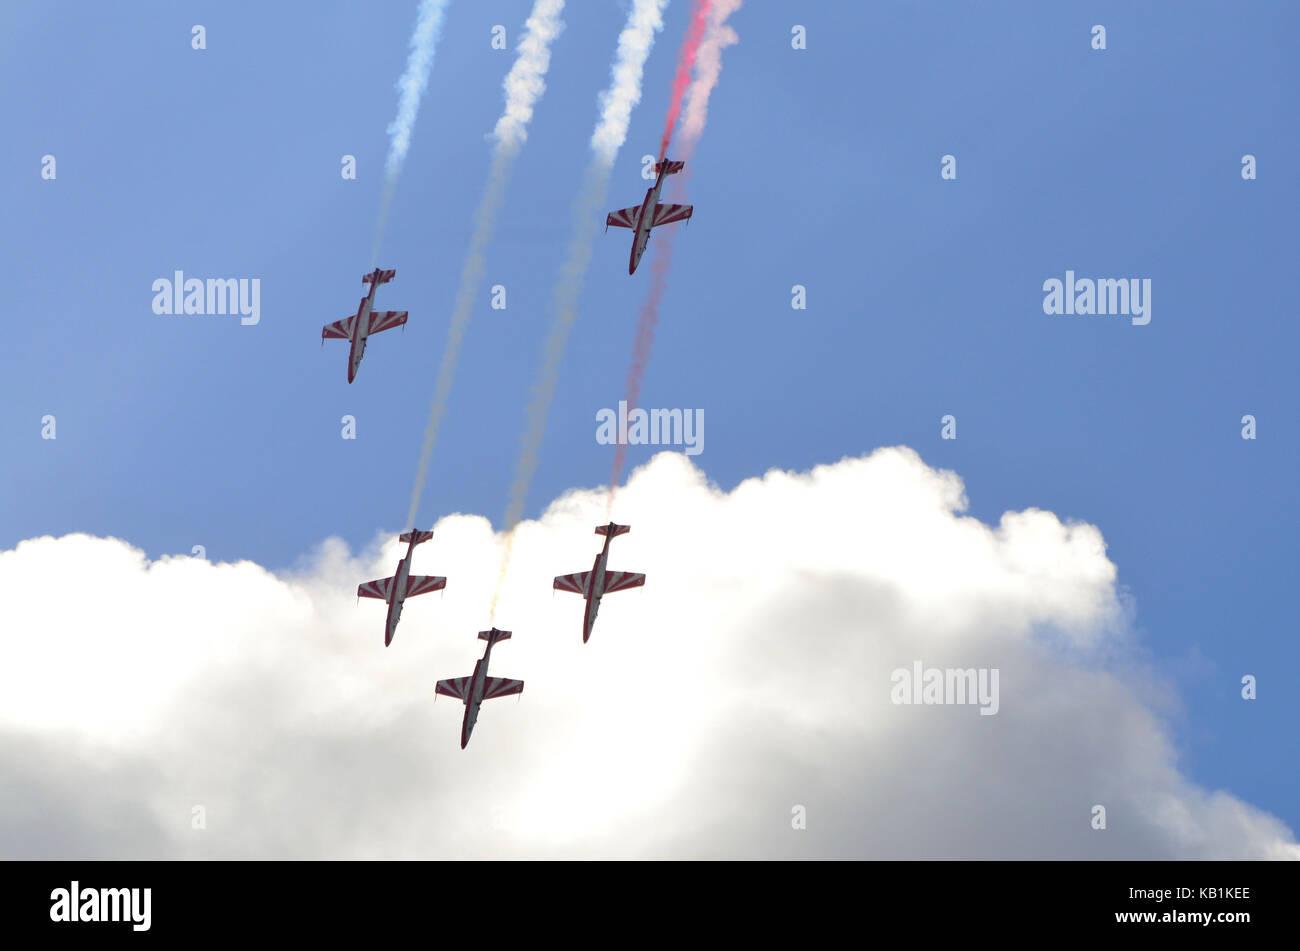 Germany, Berlin, ILA 2012, air display, aerobatic team, - Stock Image